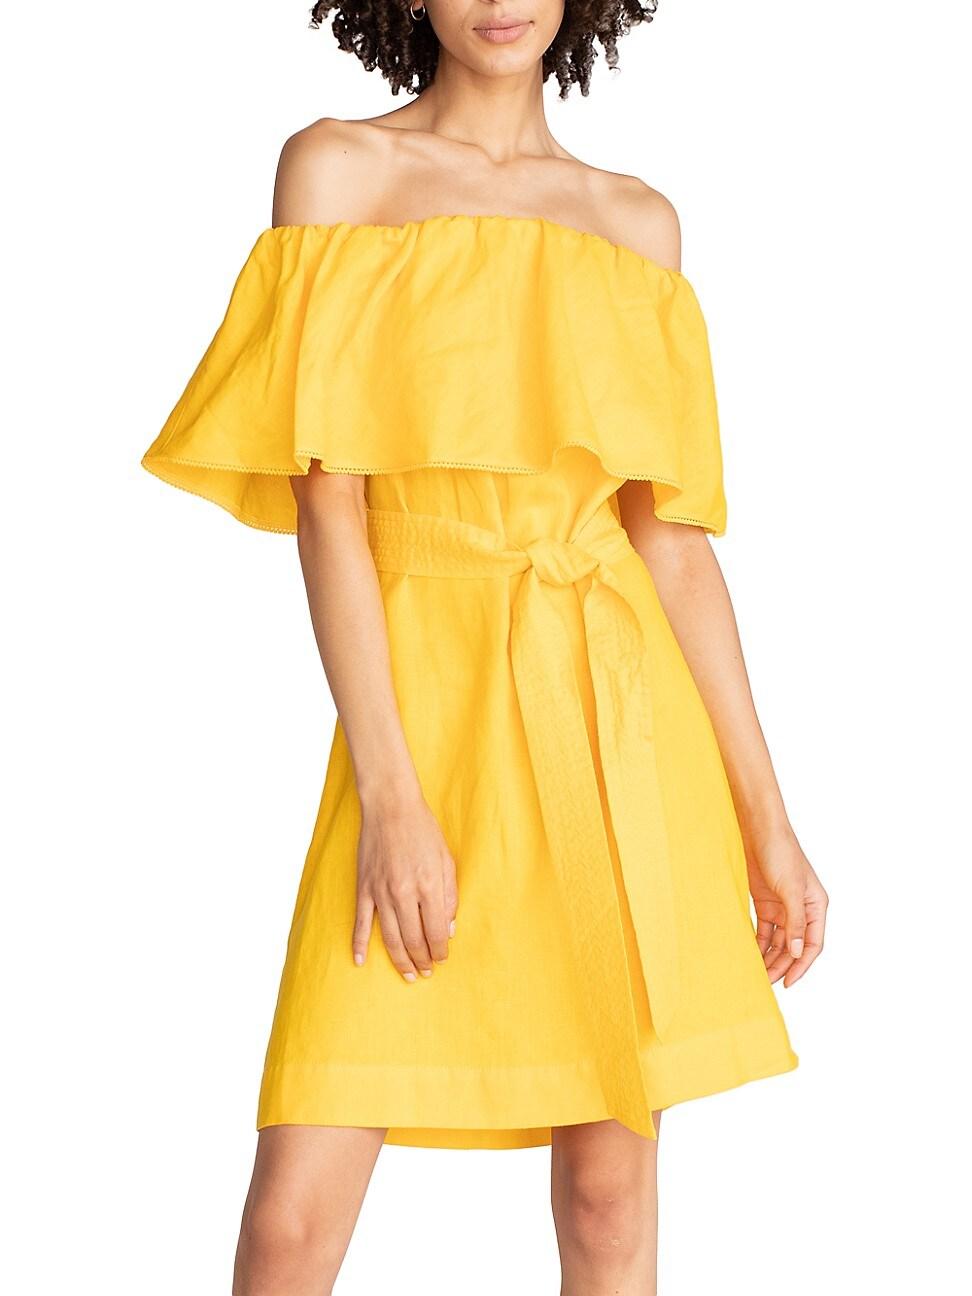 Trina Turk WOMEN'S RESTFUL LINEN DRESS